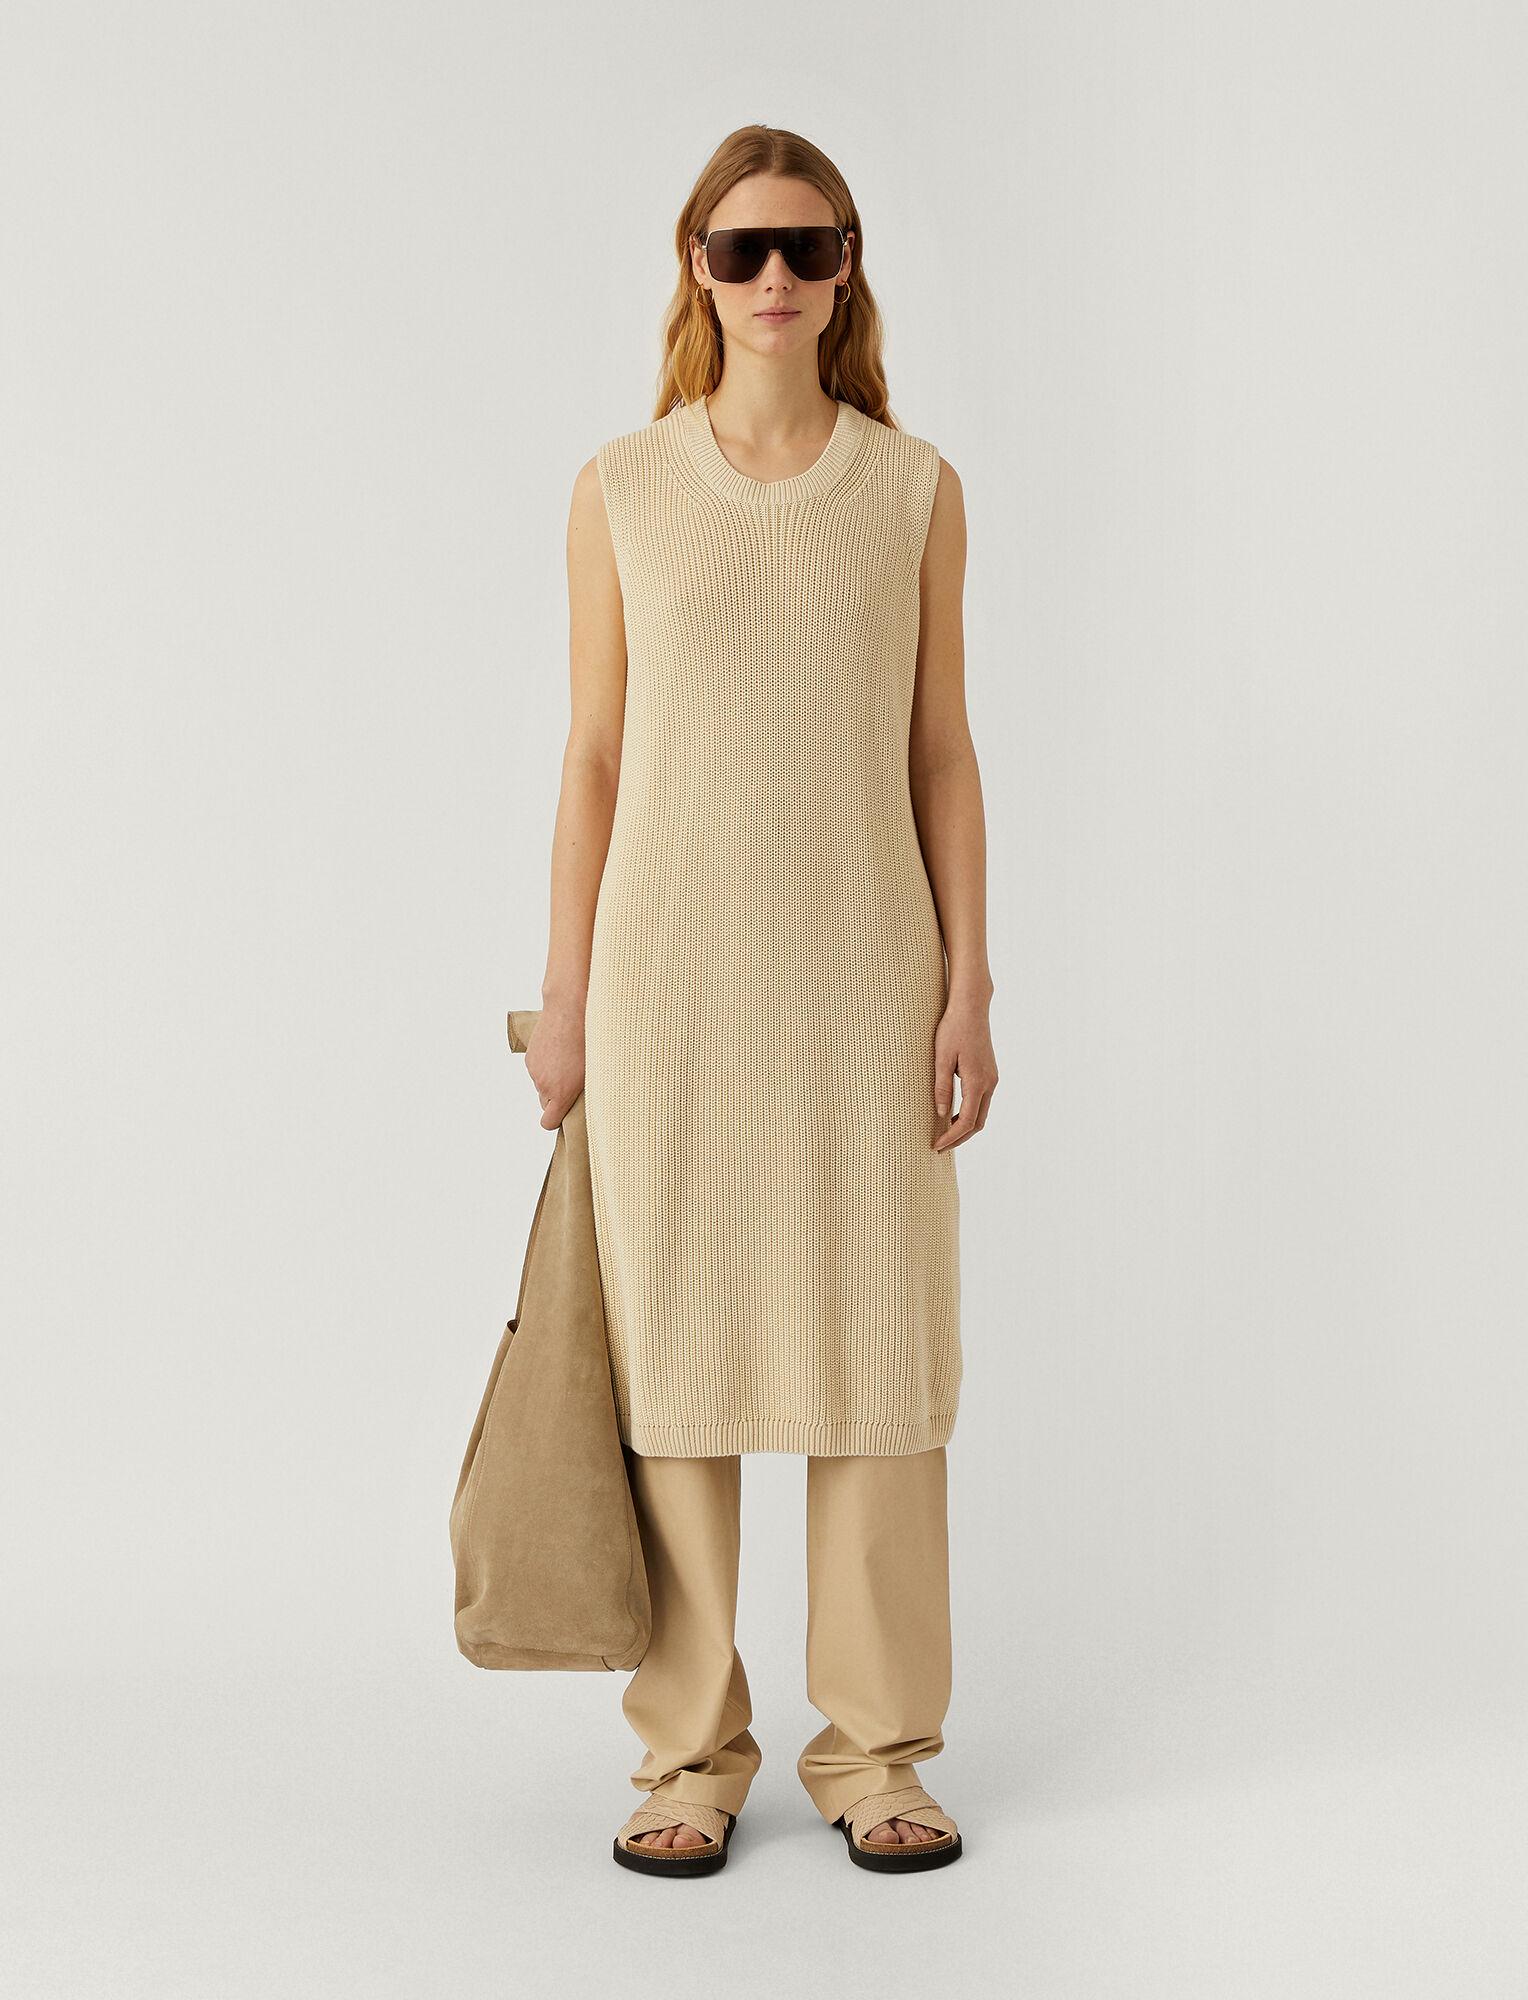 Joseph, Egyptian Cotton Dawson Dress, in IVORY